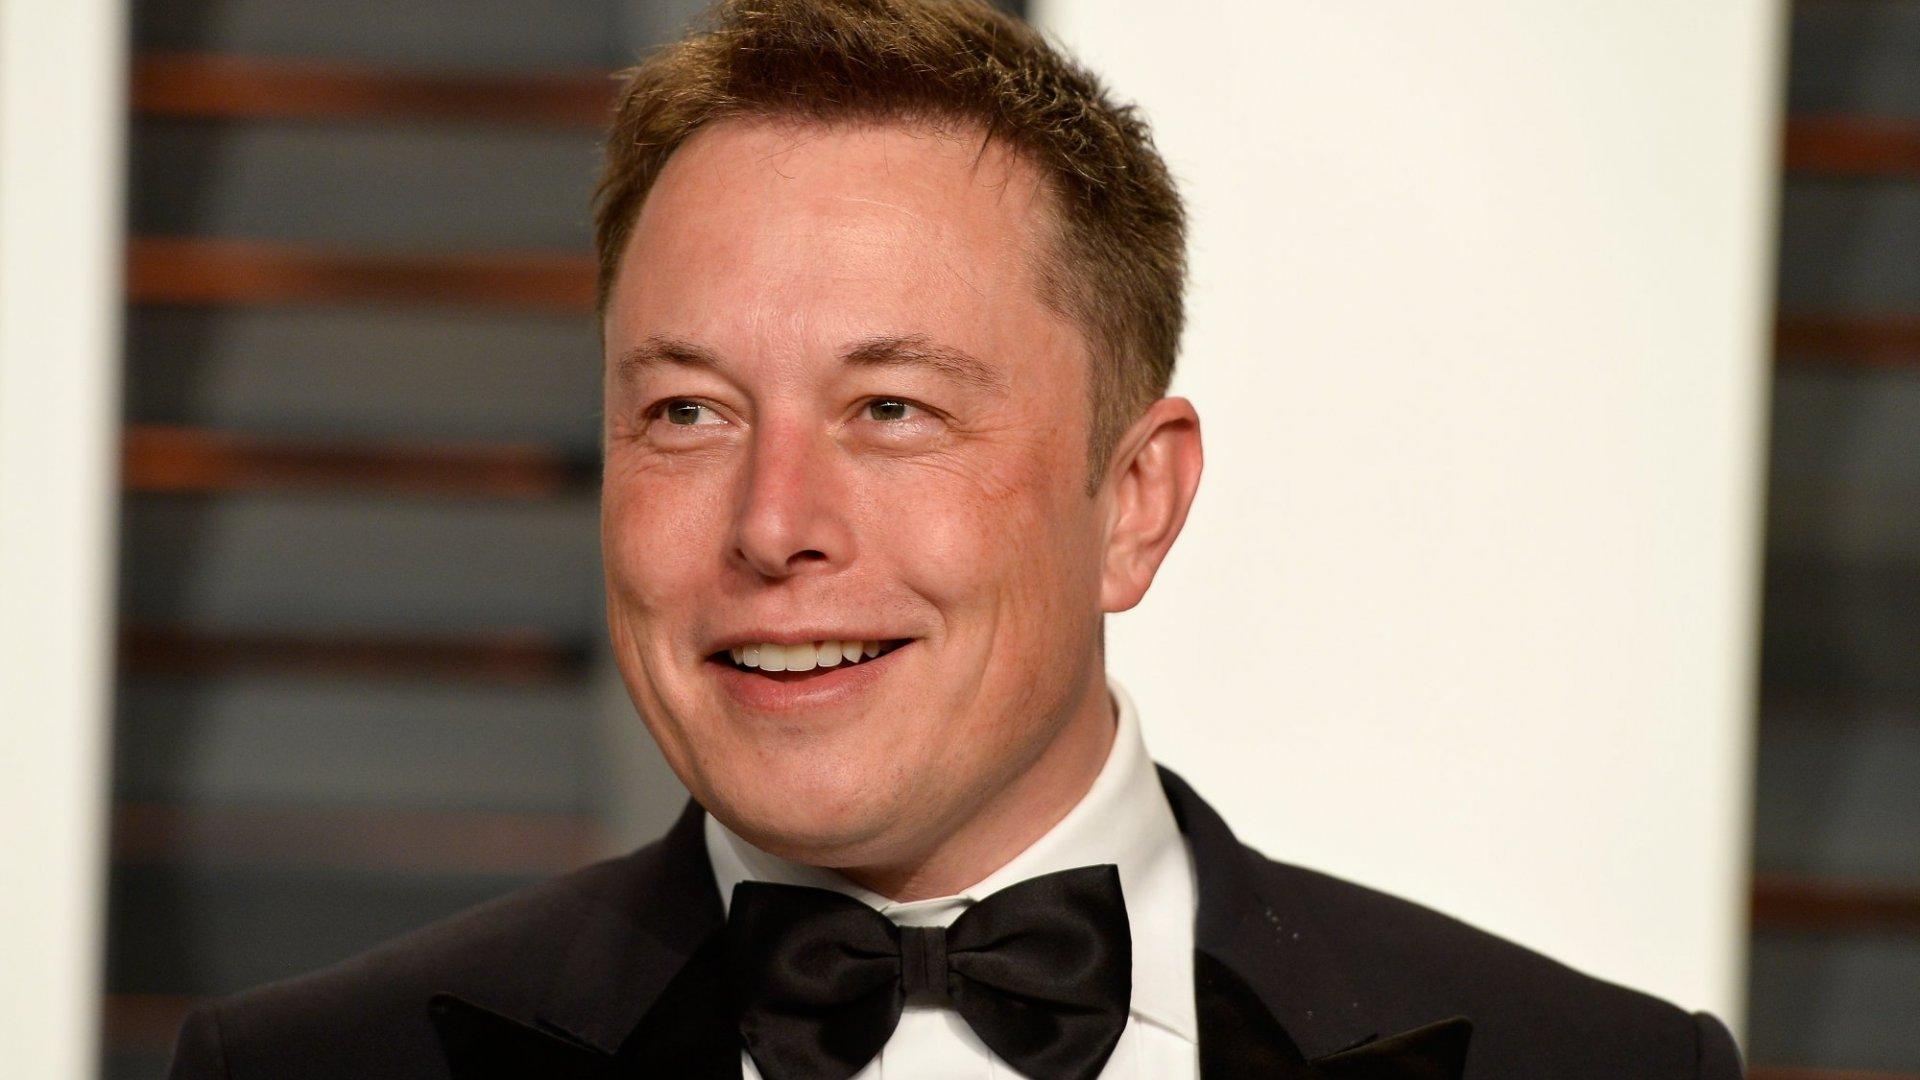 Meet the Winners of Elon Musk's Hyperloop Competition